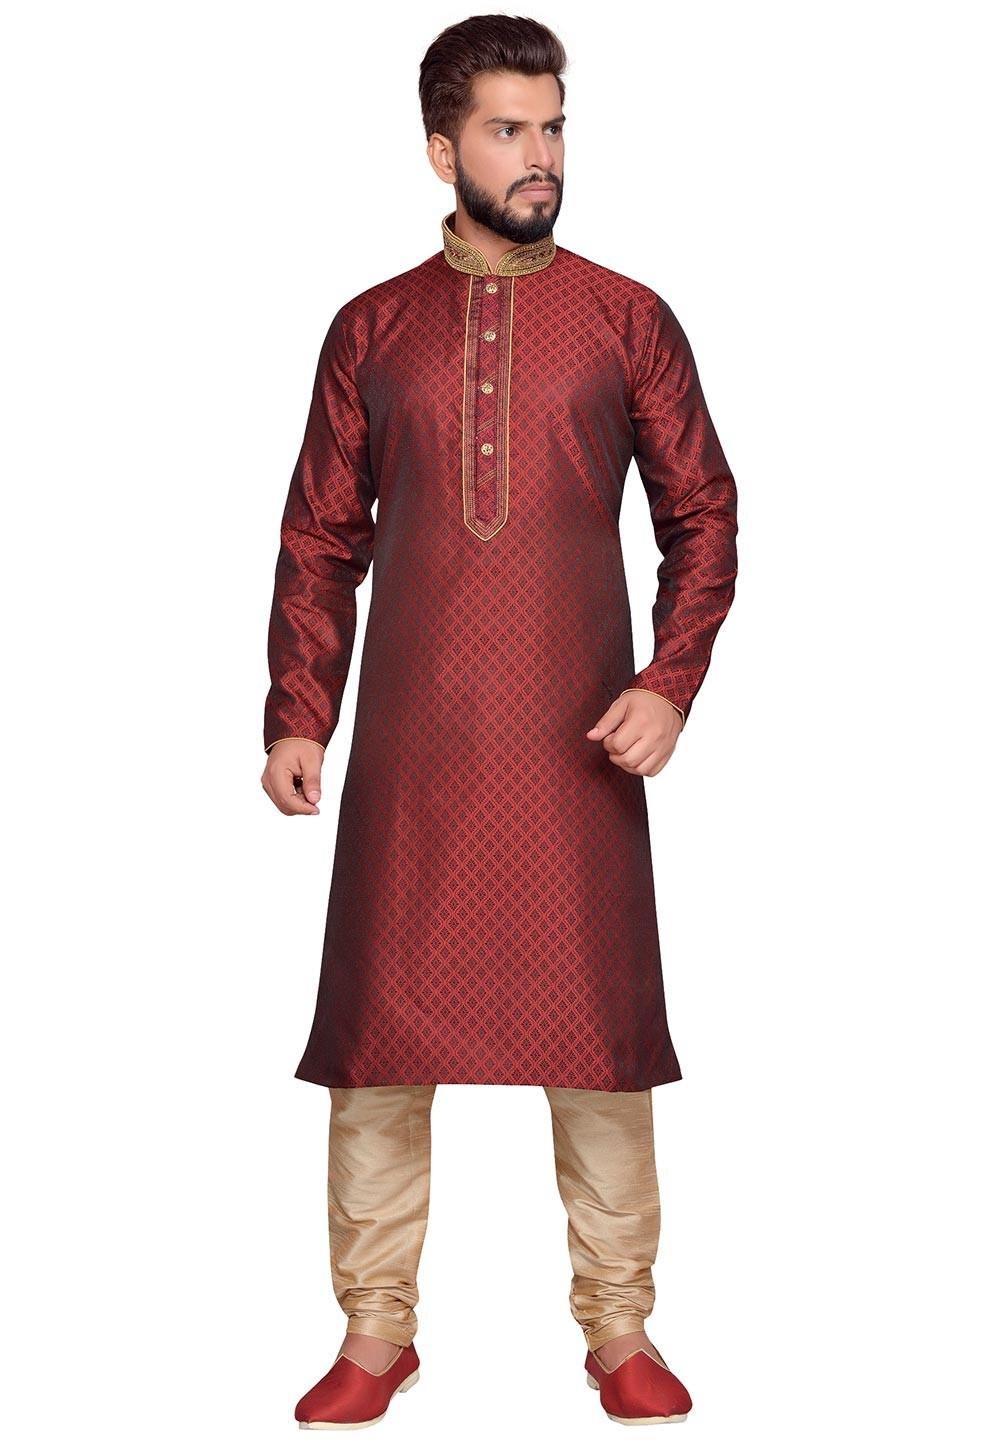 Maroon Color Brocade Fabric Party Wear Kurta Pajama in Thread Work.